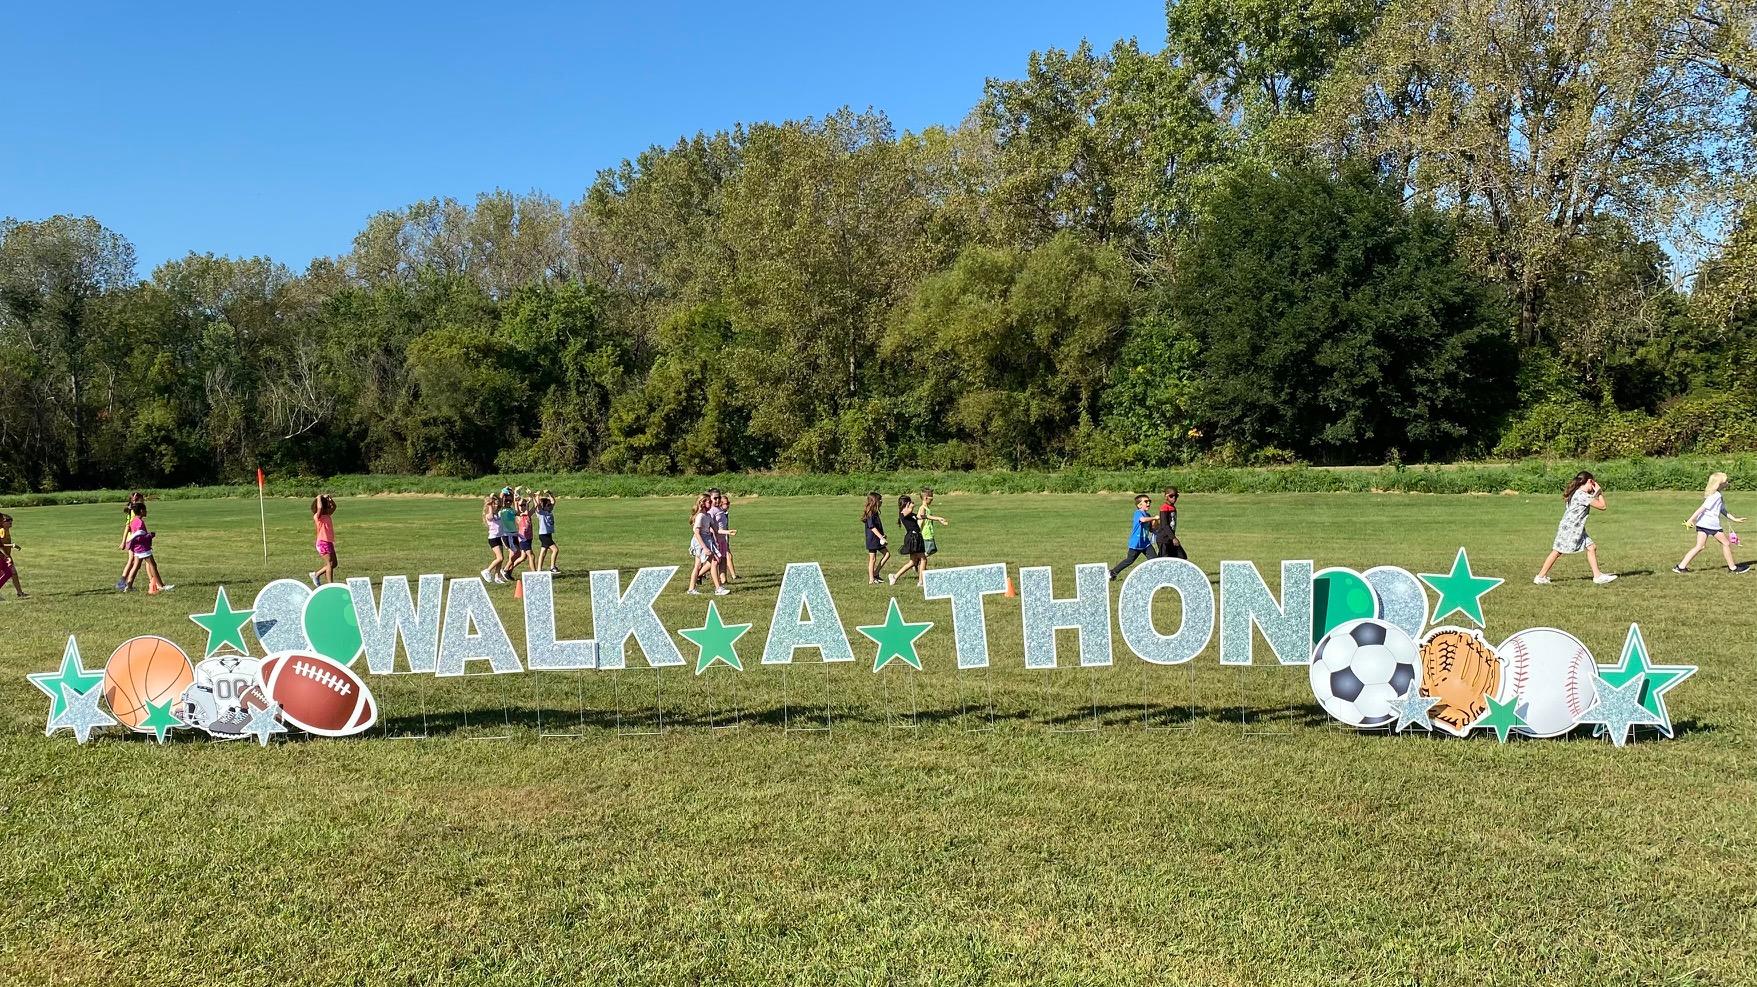 Friday, Sept. 17th Walkathon at Peifer Elementary School